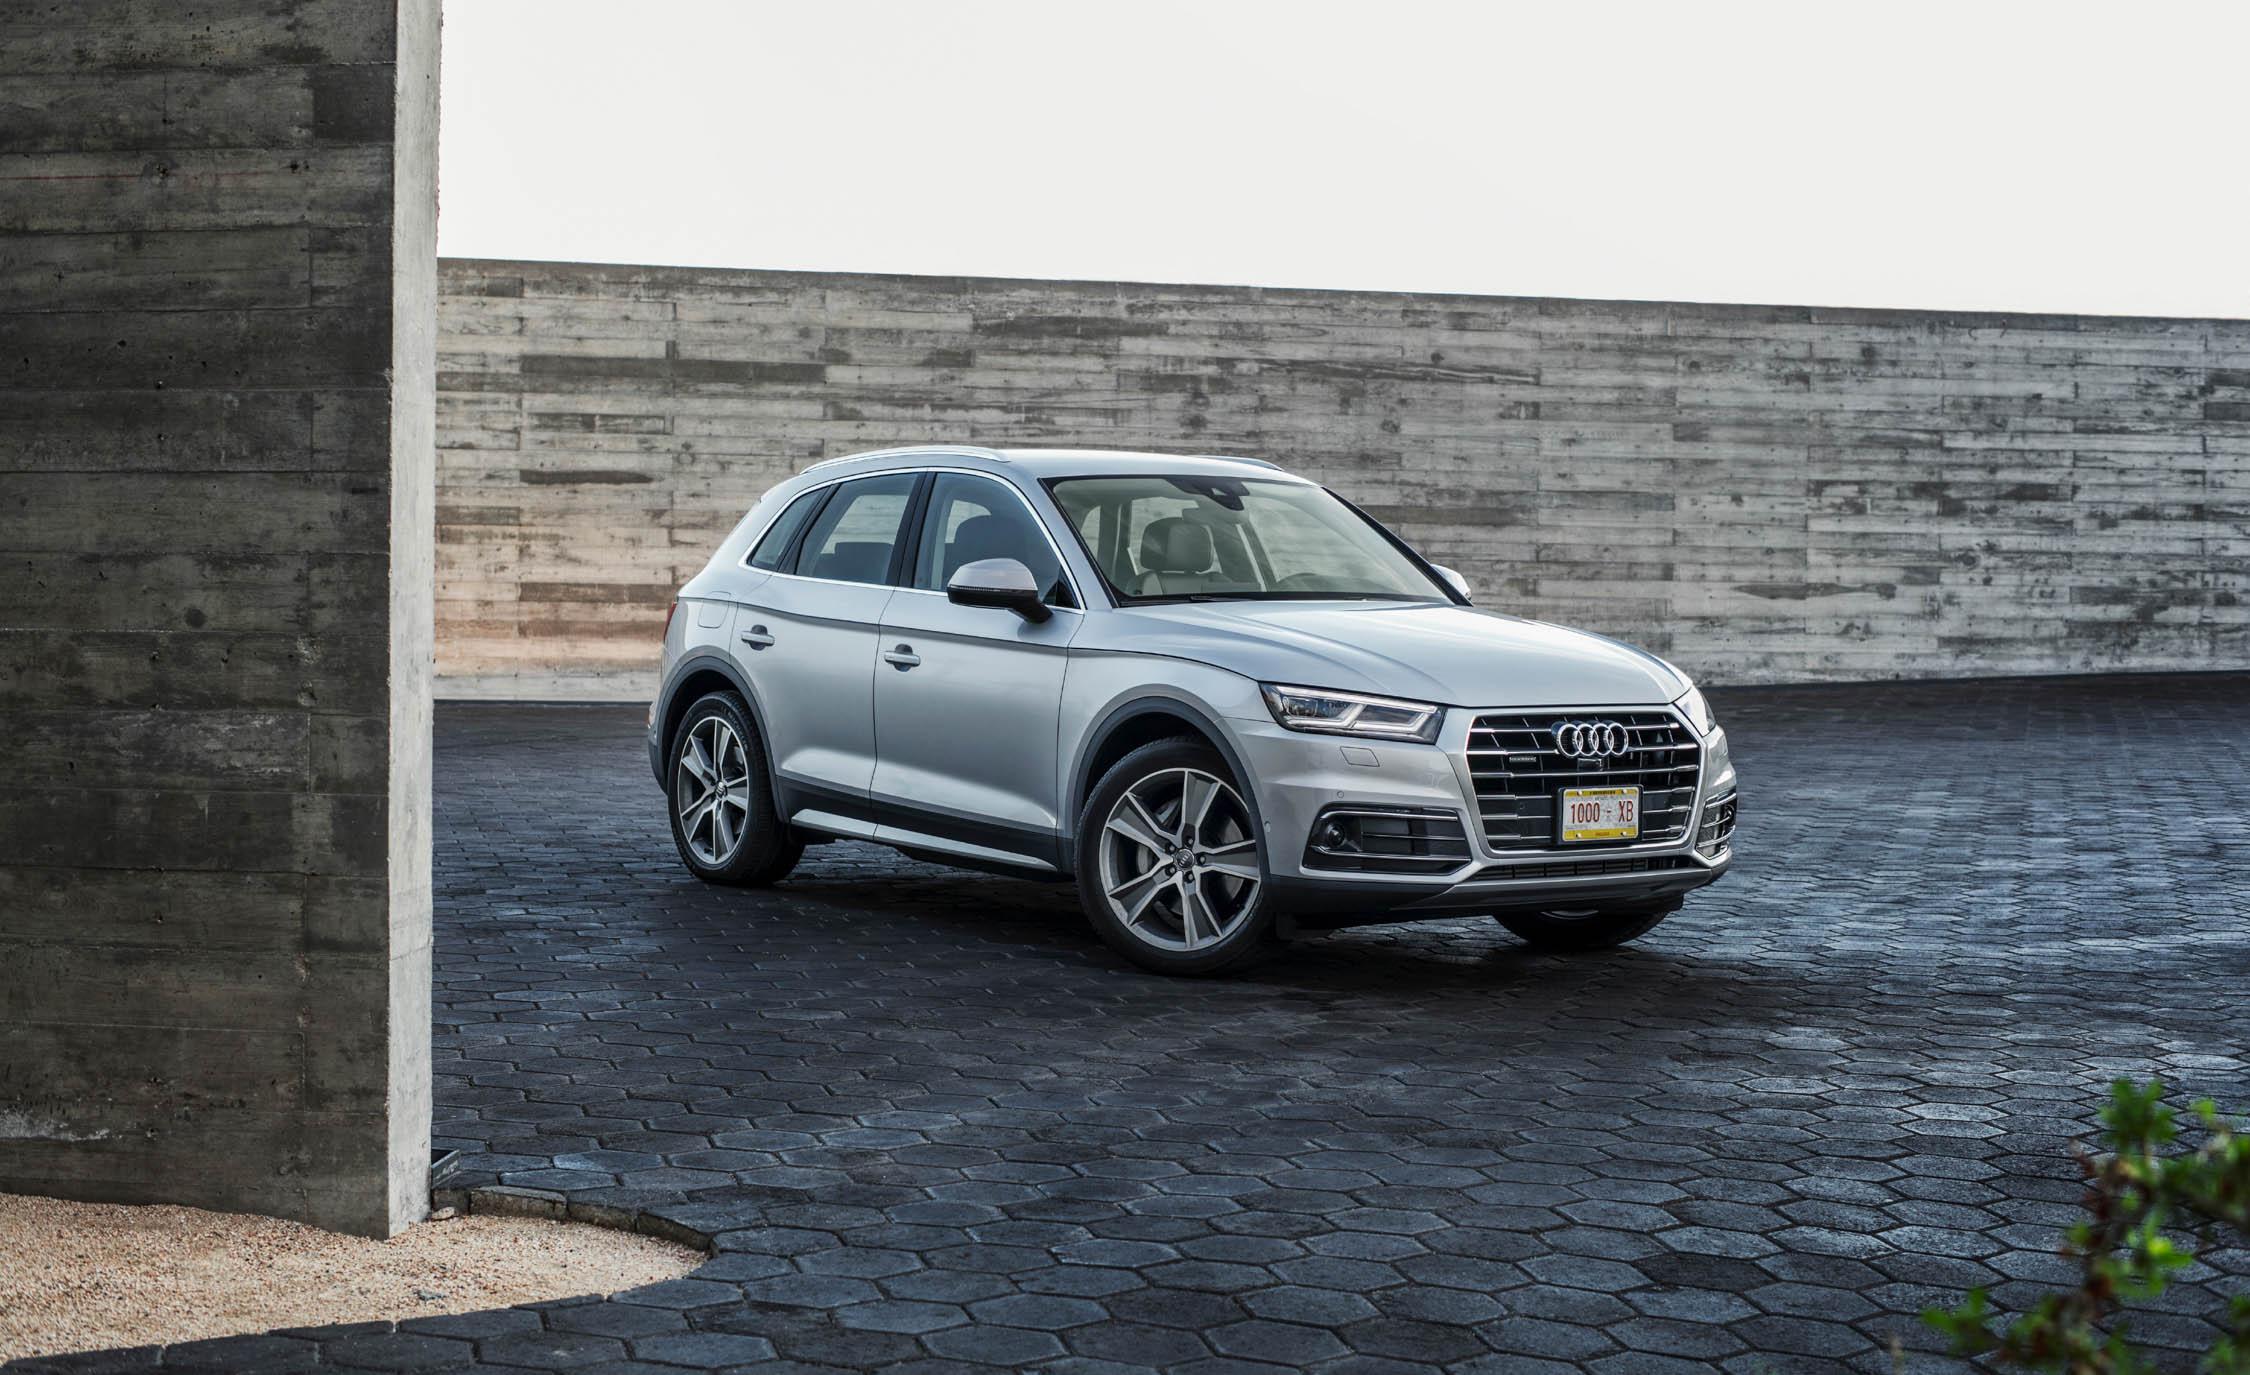 2018 Audi Q (View 1 of 40)